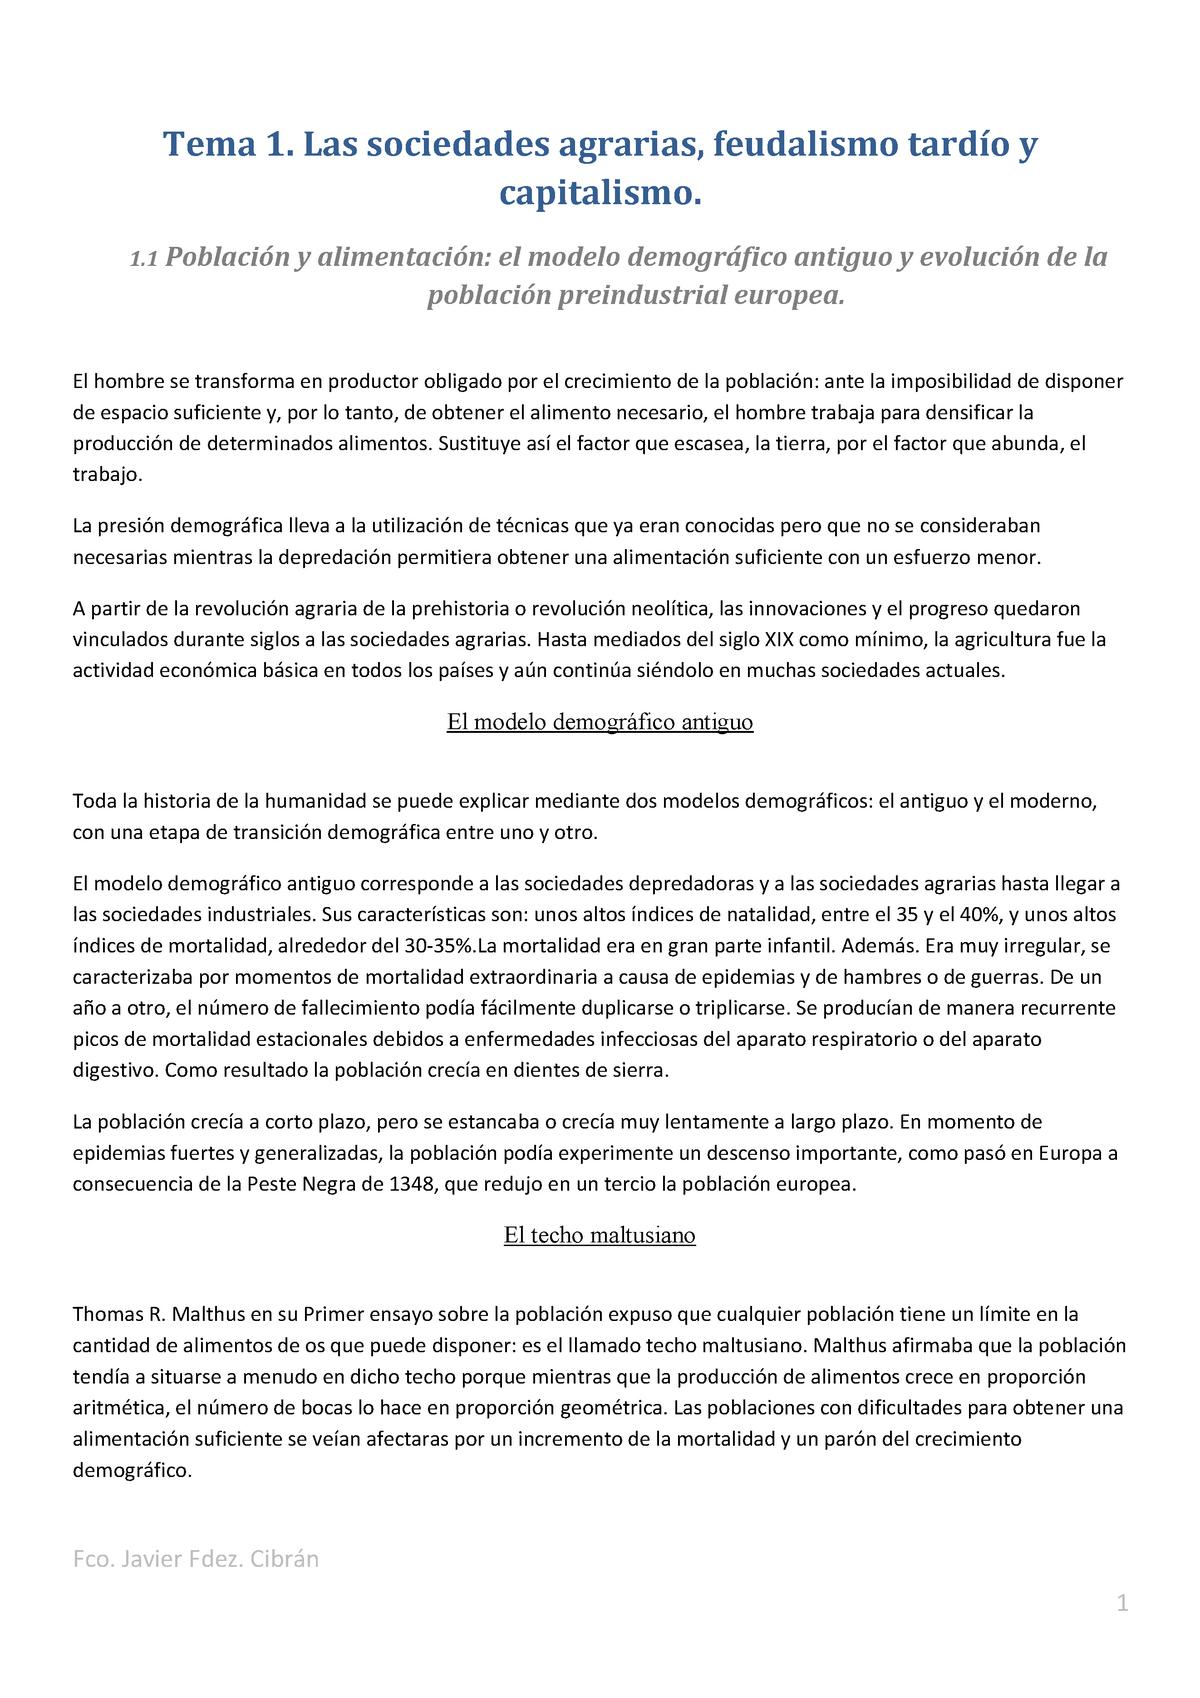 Tema 1 Historia Económica 802263 Ucm Studocu